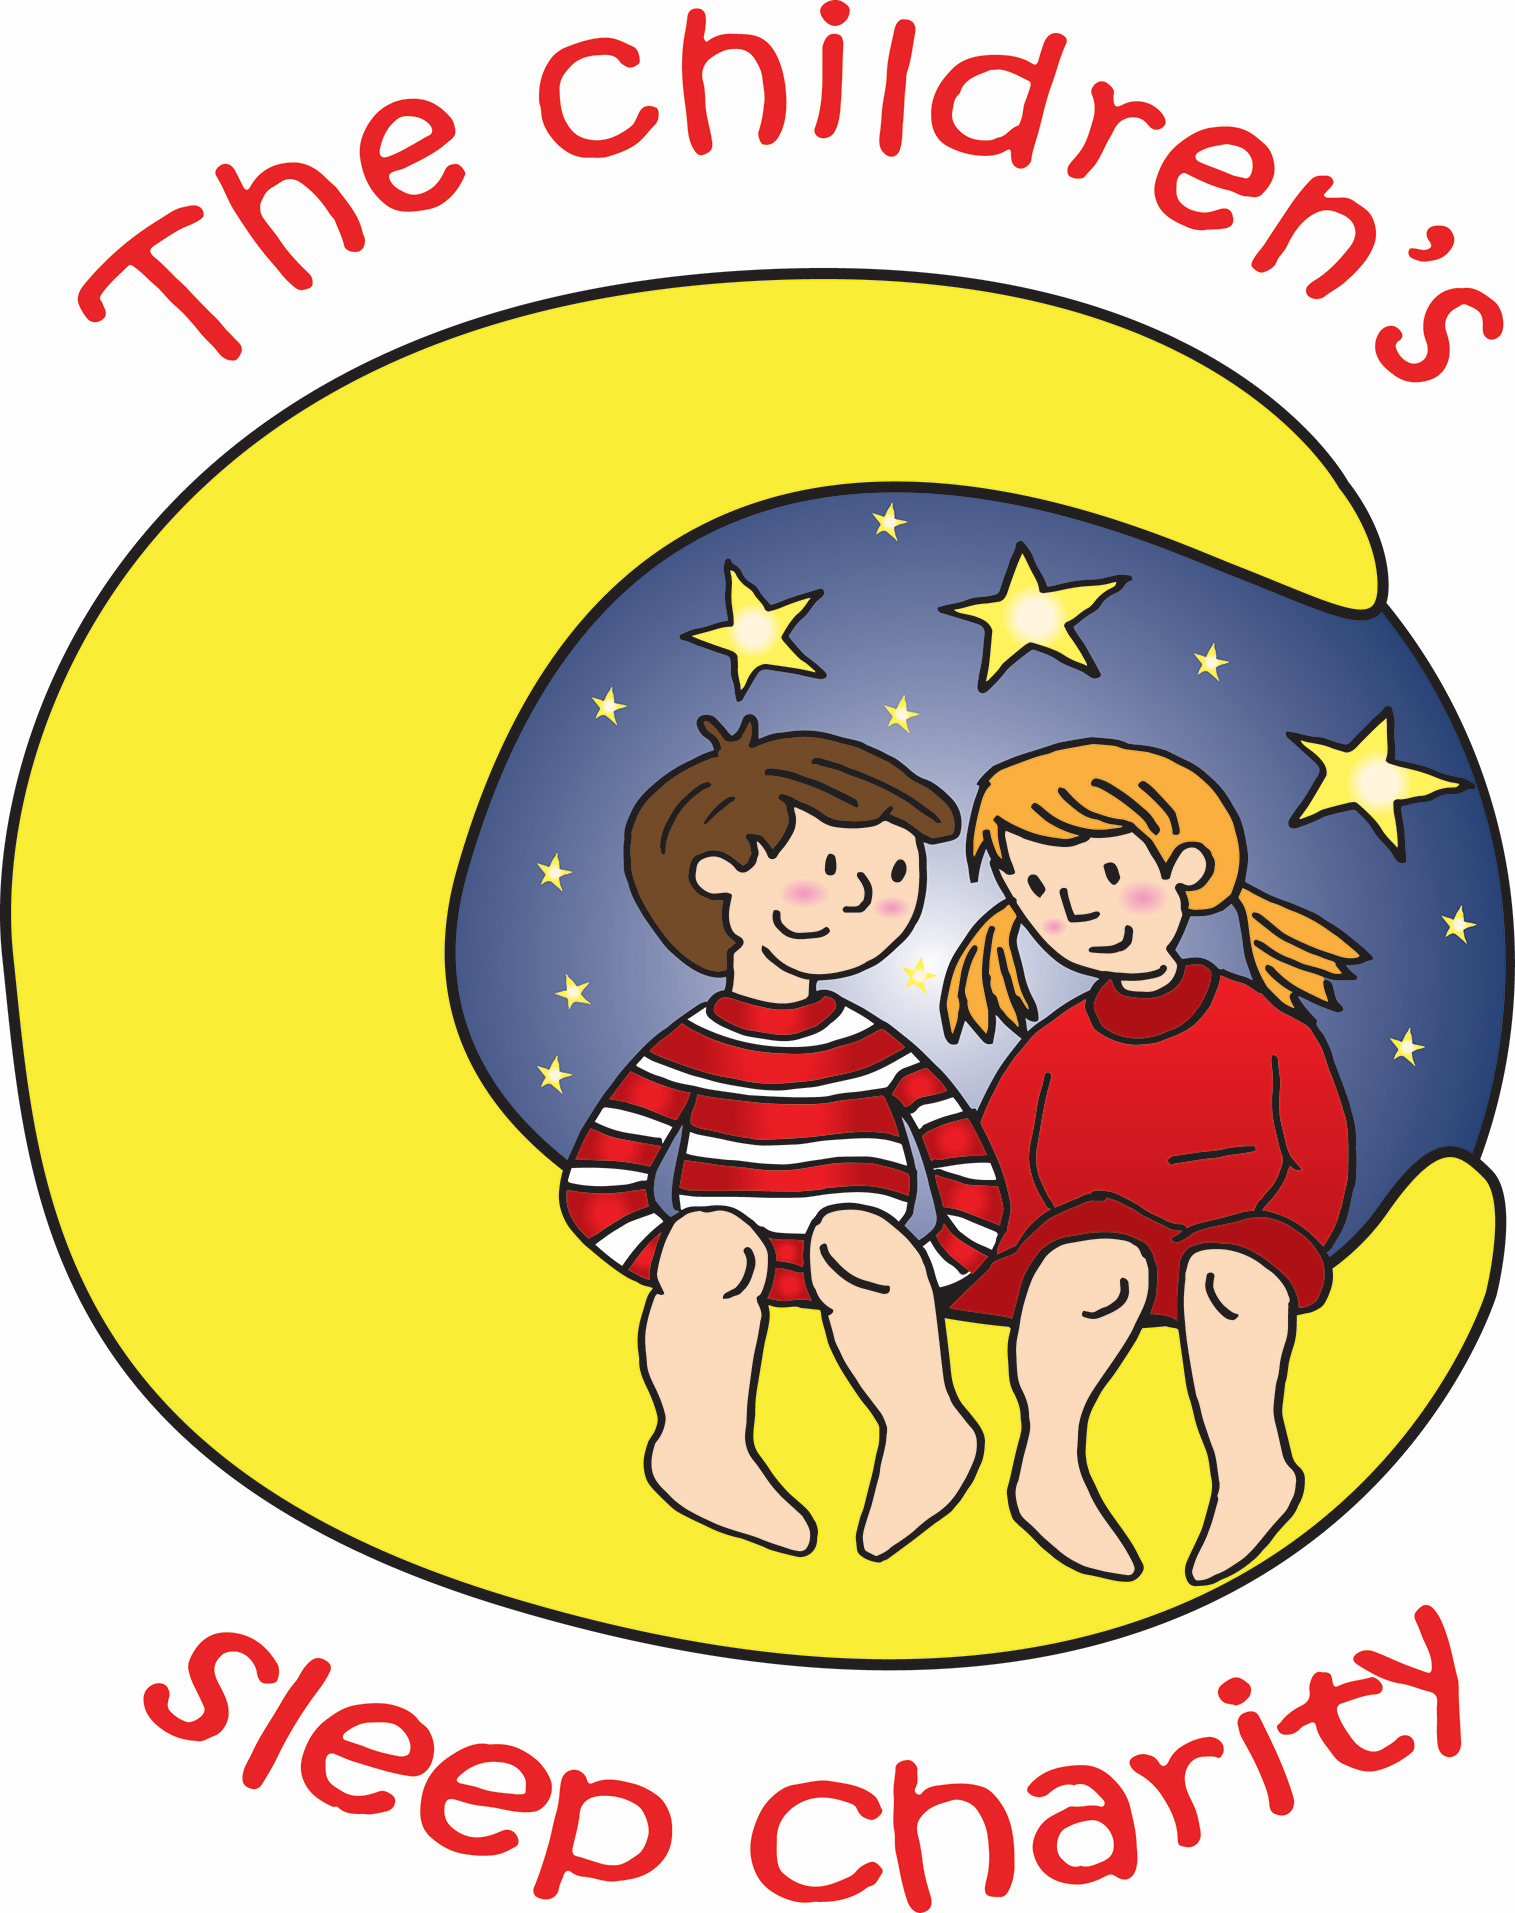 children's sleep charity logo.png